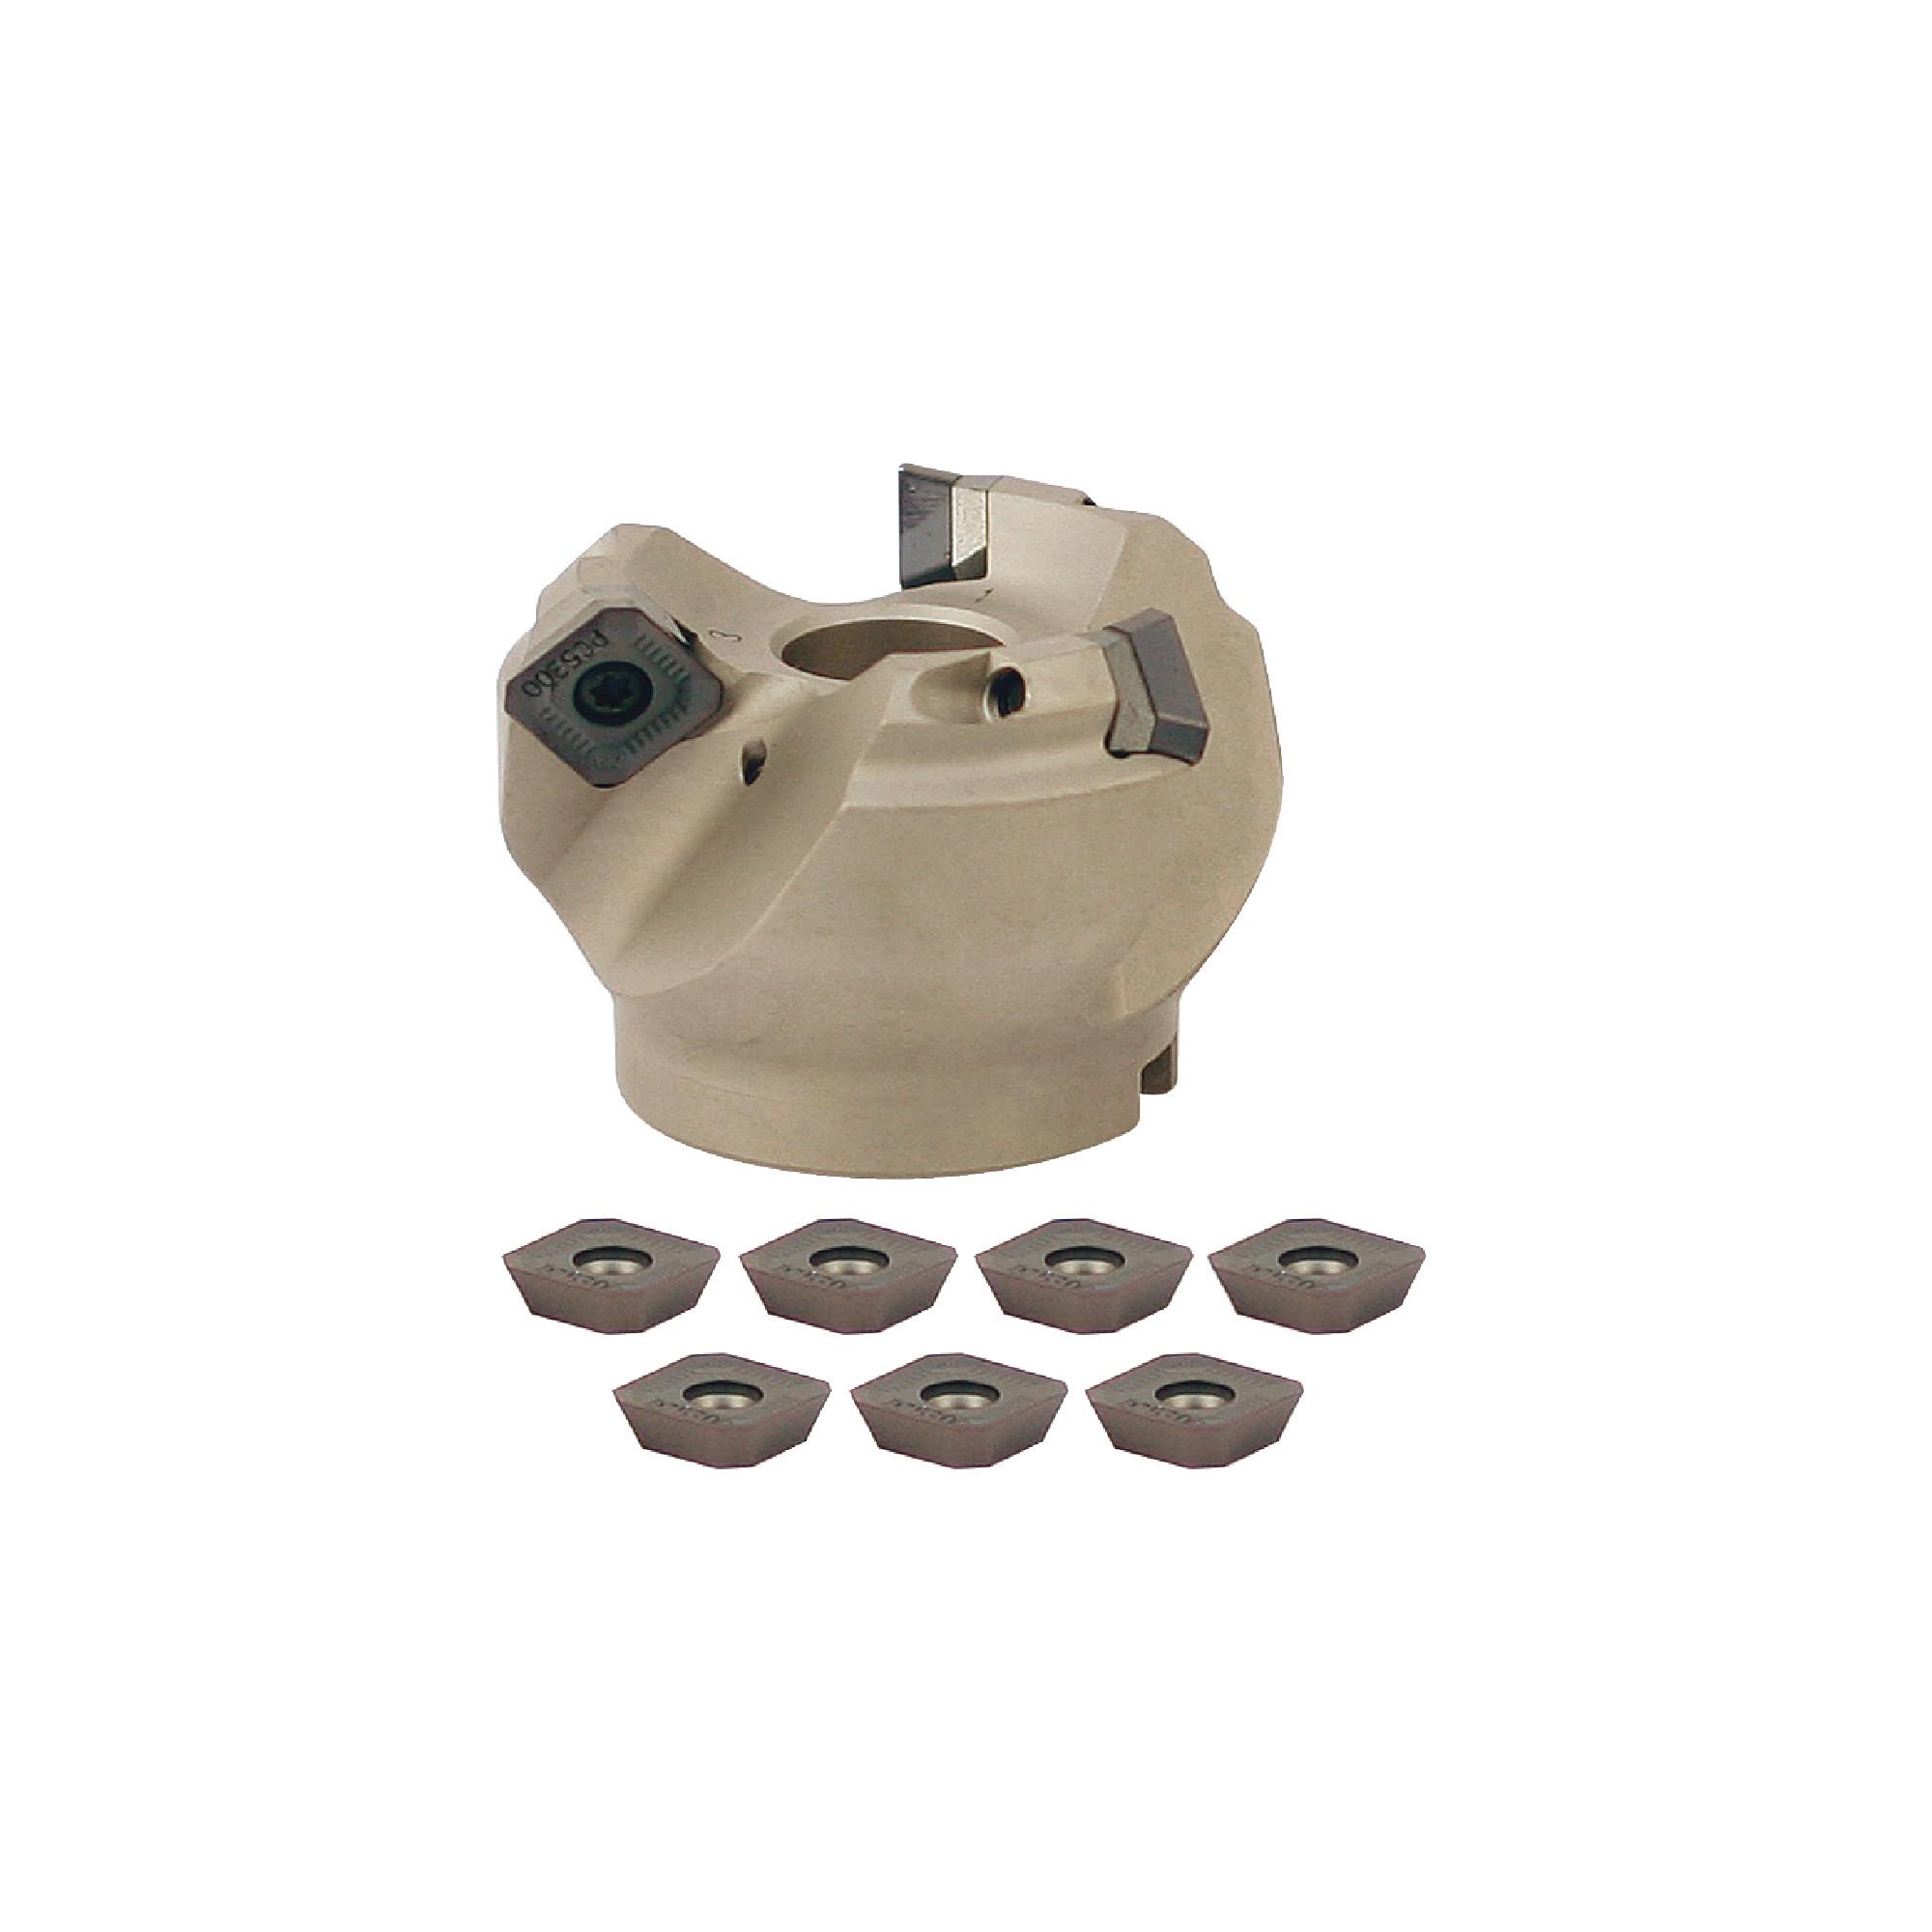 "KORLOY - 2.000"" - 45° Face Mill Set / Includes: (1) FMACA4200HR (2.0"" ø) & (10) SEXT14M4AGSN-MM PC5300 Coate"